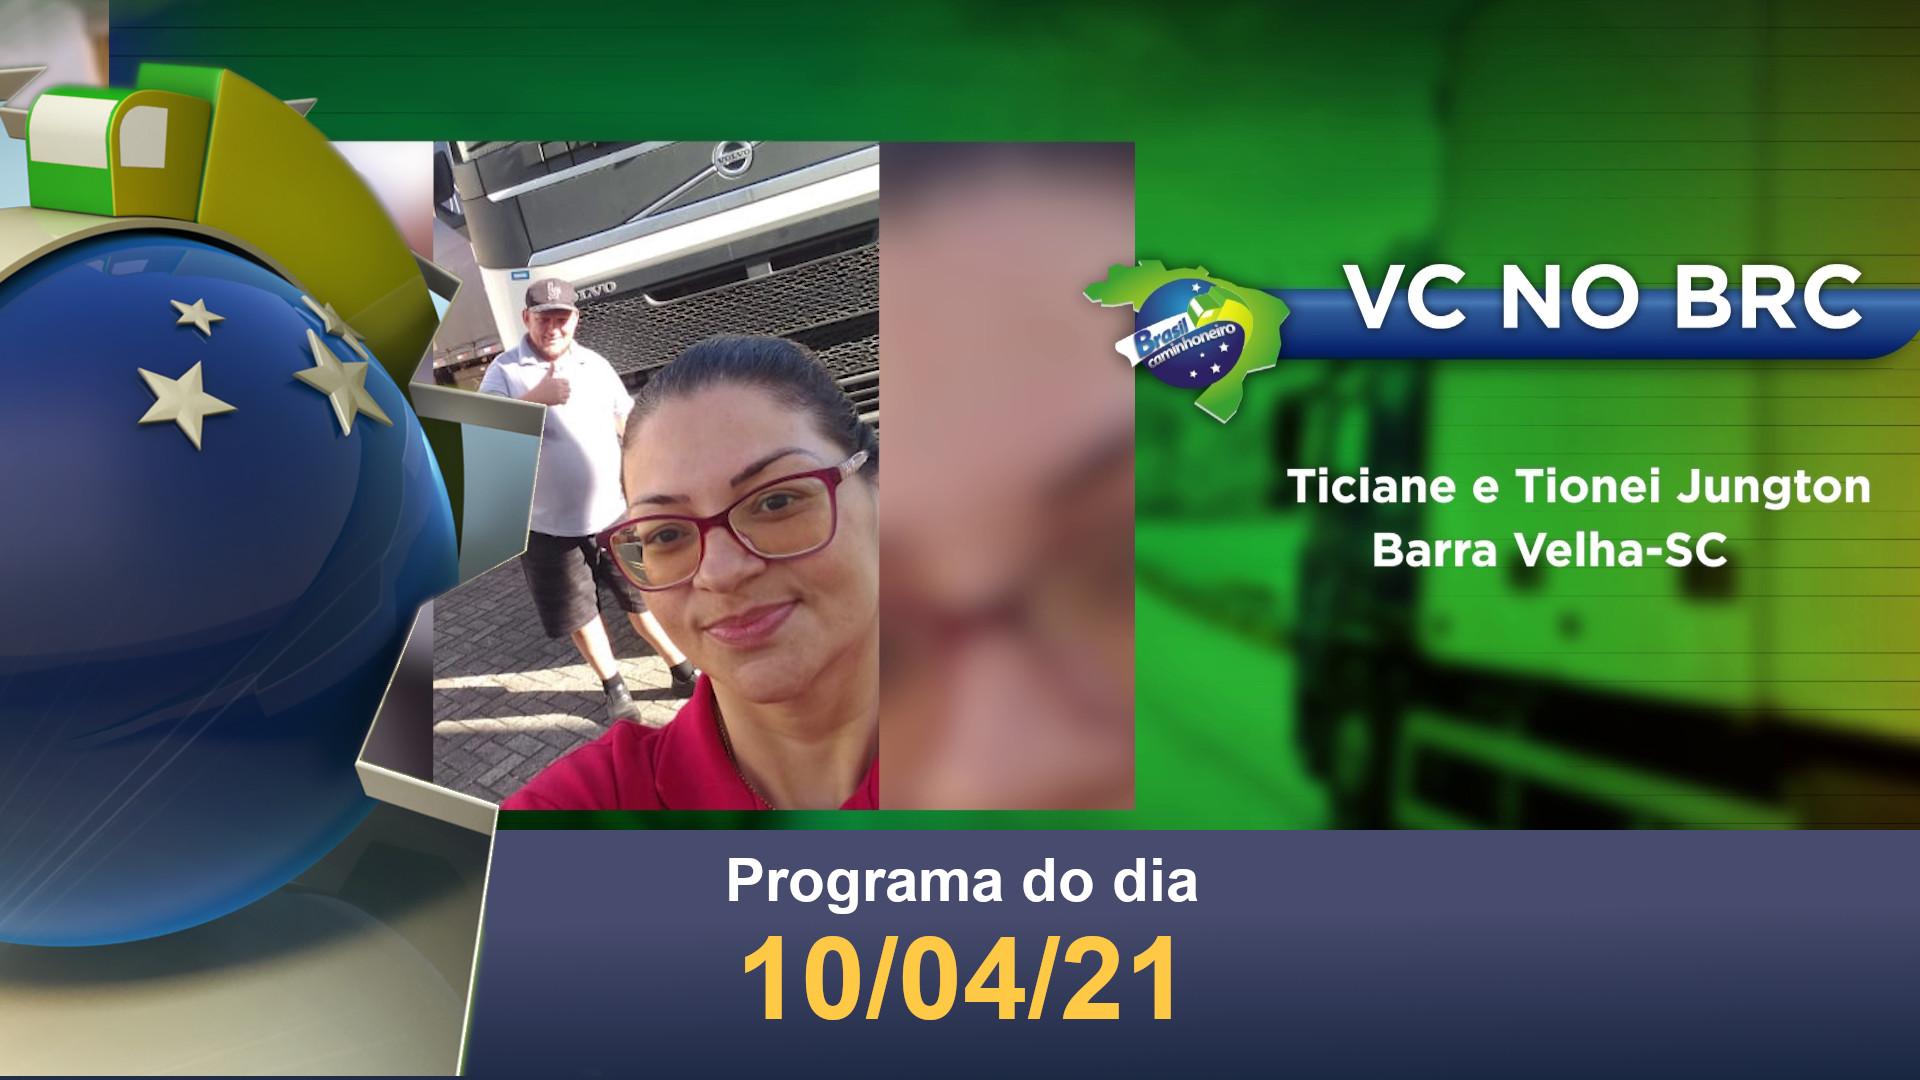 VC NO BRC